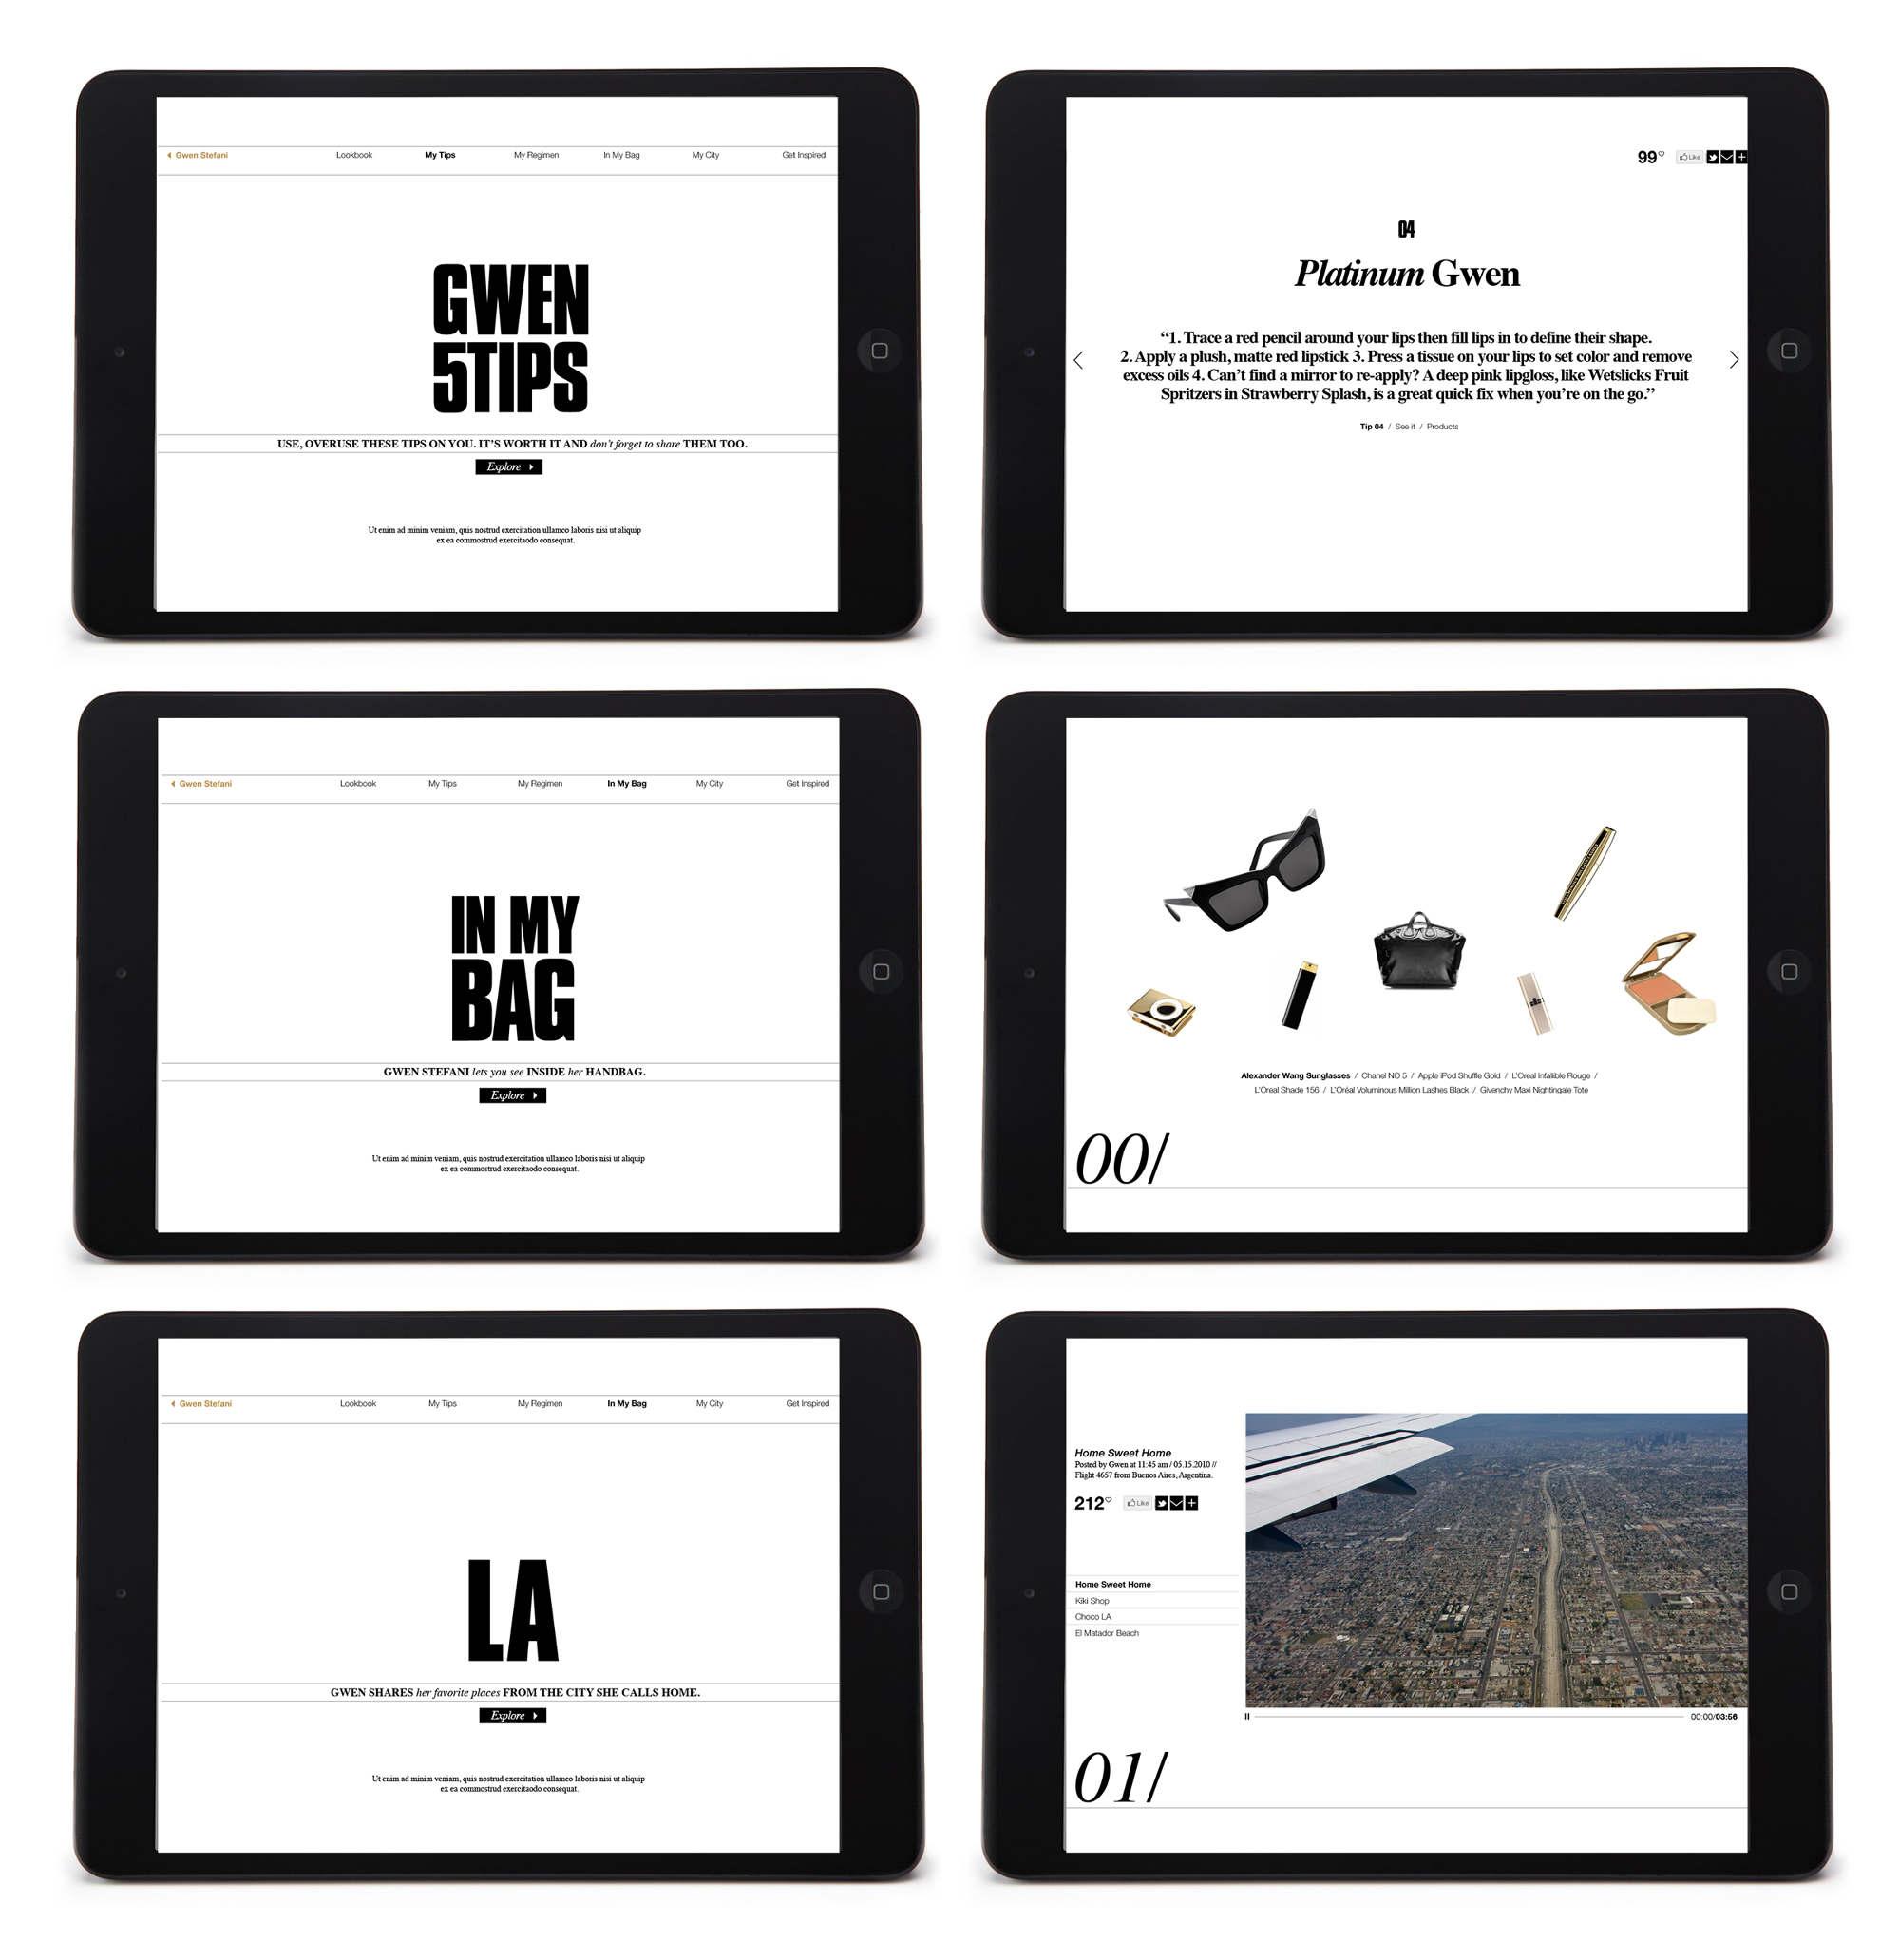 PlatformRedesign_iPad_4up_2500px_2000_c.jpg